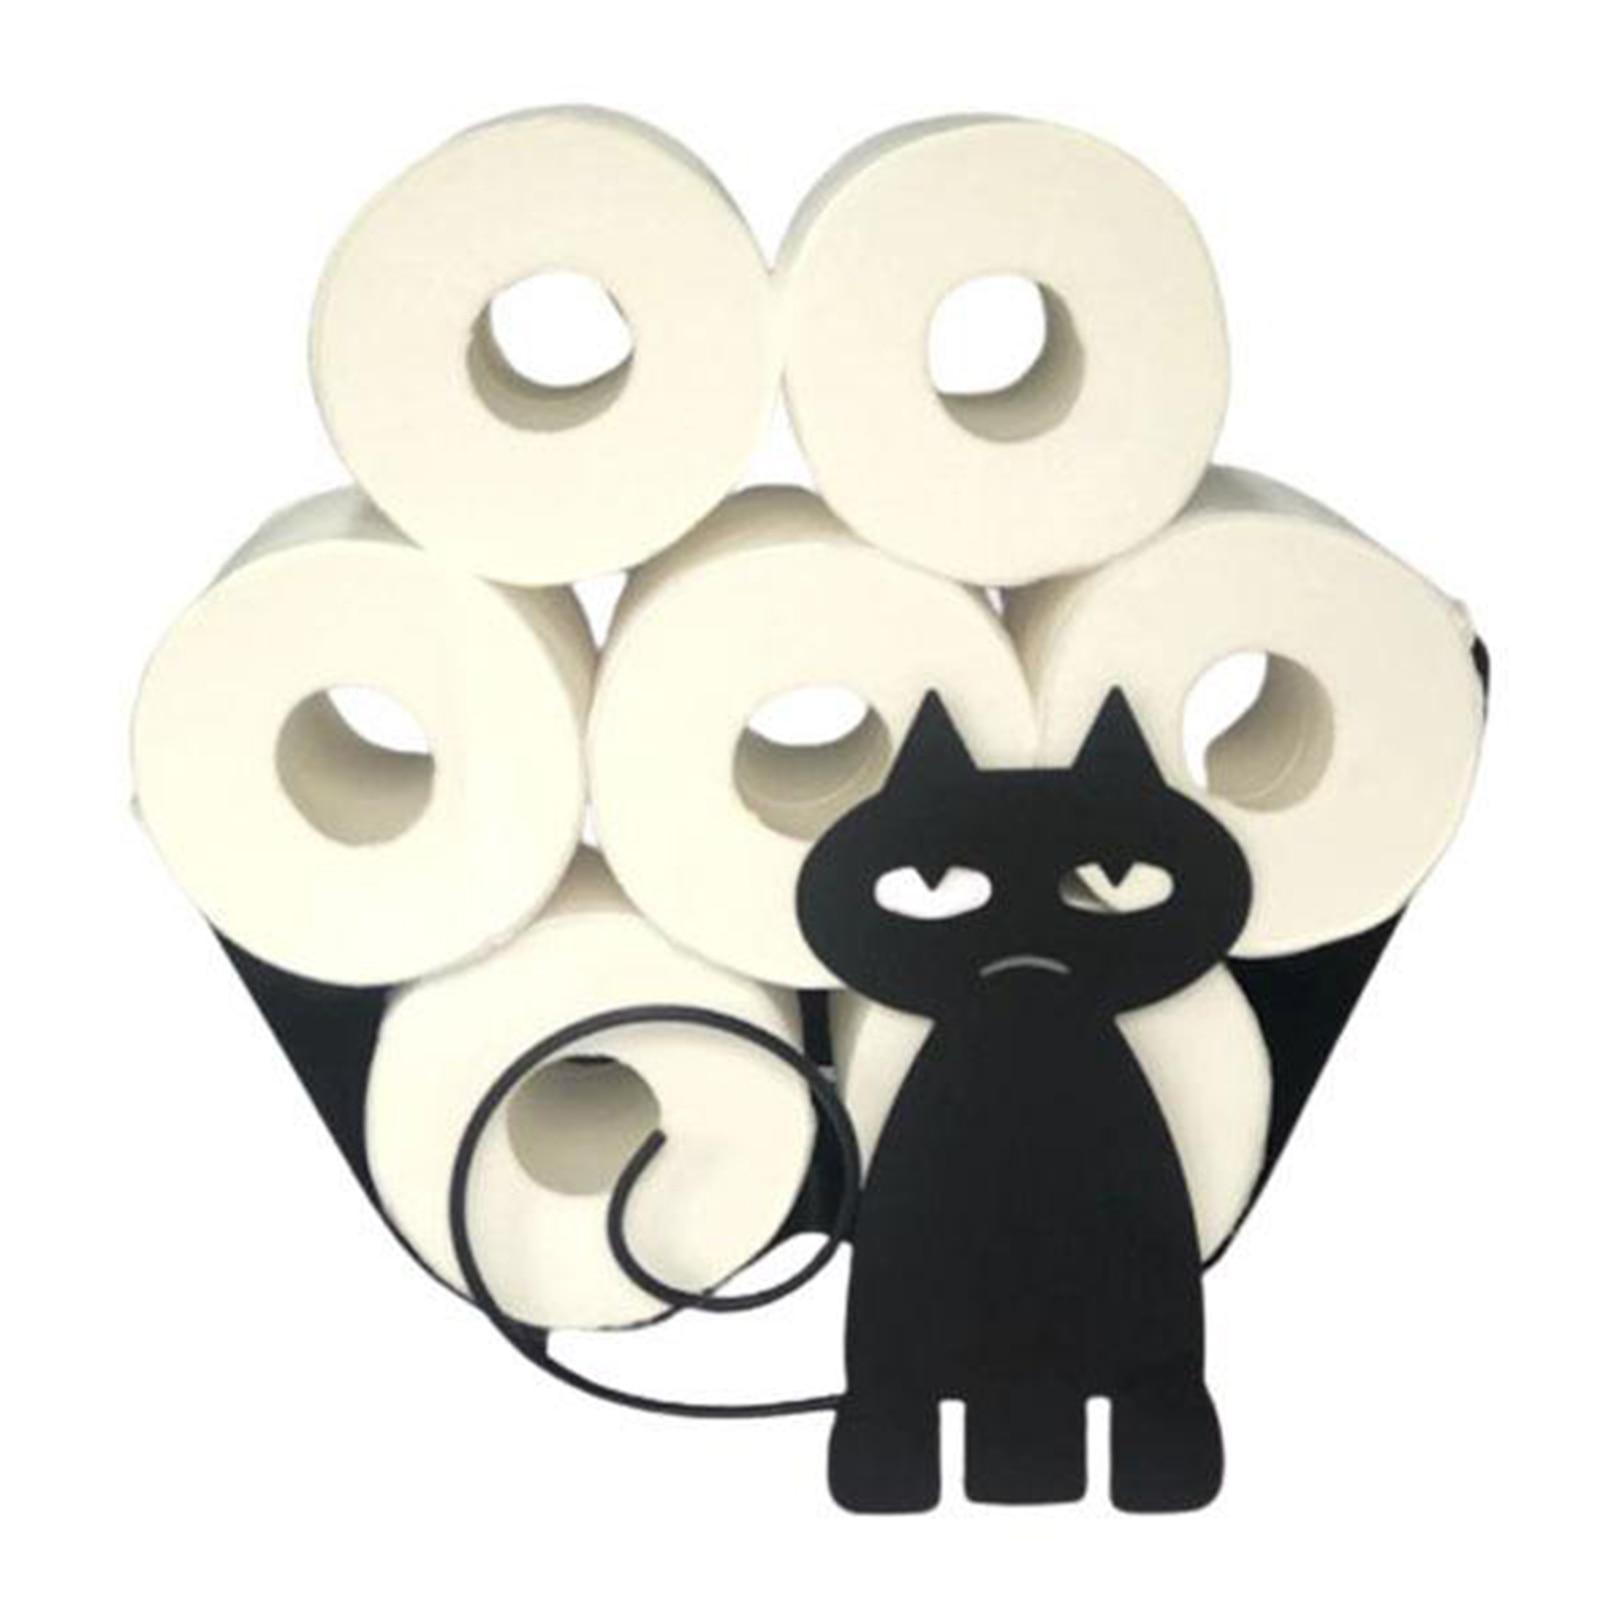 Iron Black Cat Toilet Paper or Towel Holder Storage Rack